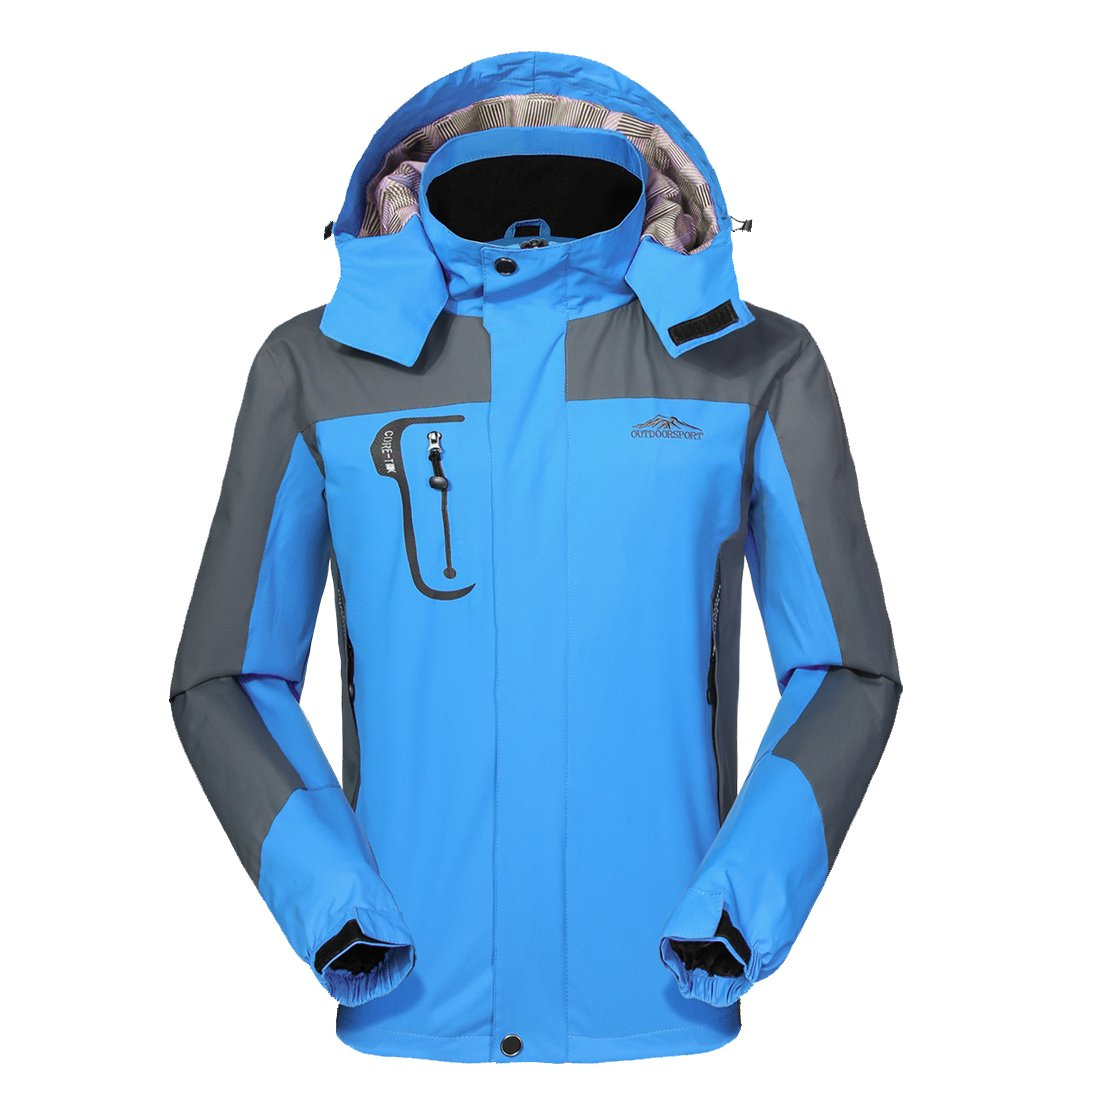 602f63b59 Waterproof Jacket Mens Raincoats-GIVBRO New Design Outdoor Hooded  Lightweight Softshell Hiking Windproof Rain Jackets